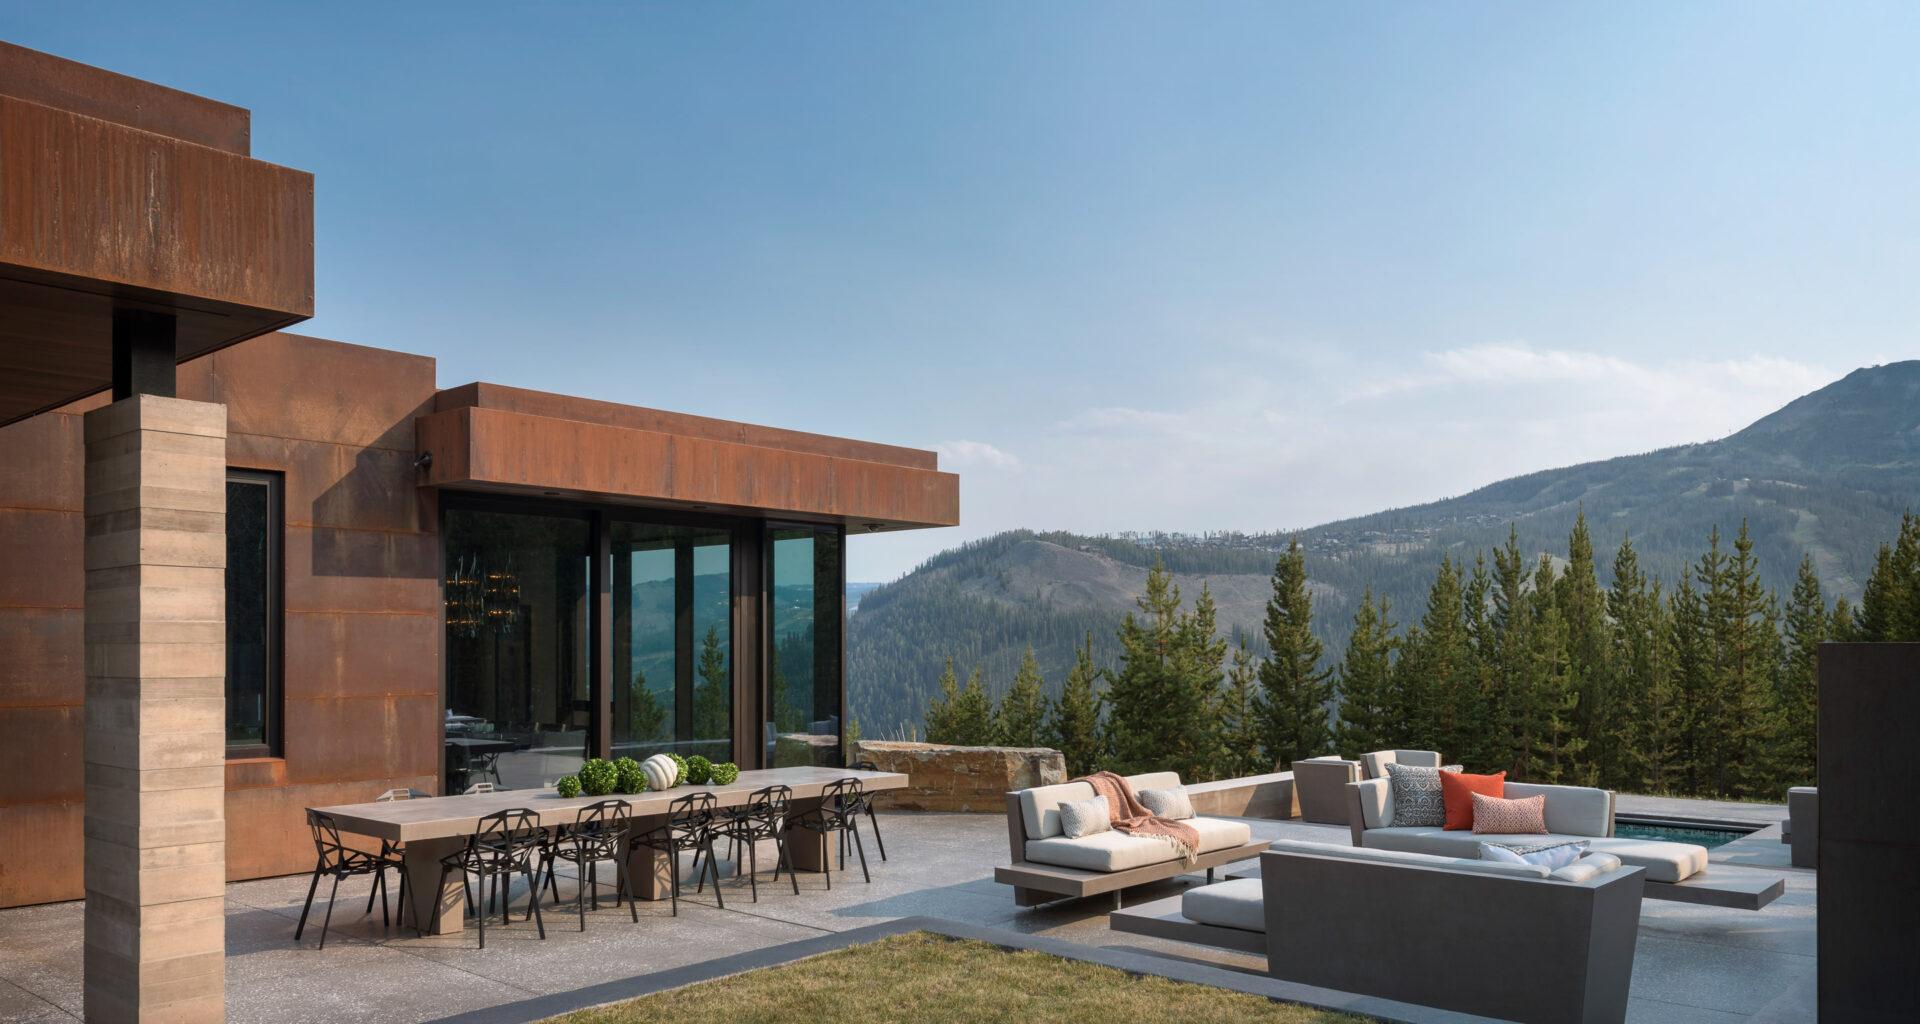 Stuart Silk, Stuart Silk Architects, Big Sky, Montana, modern home, extreme landscape, winter, architect, architecture,